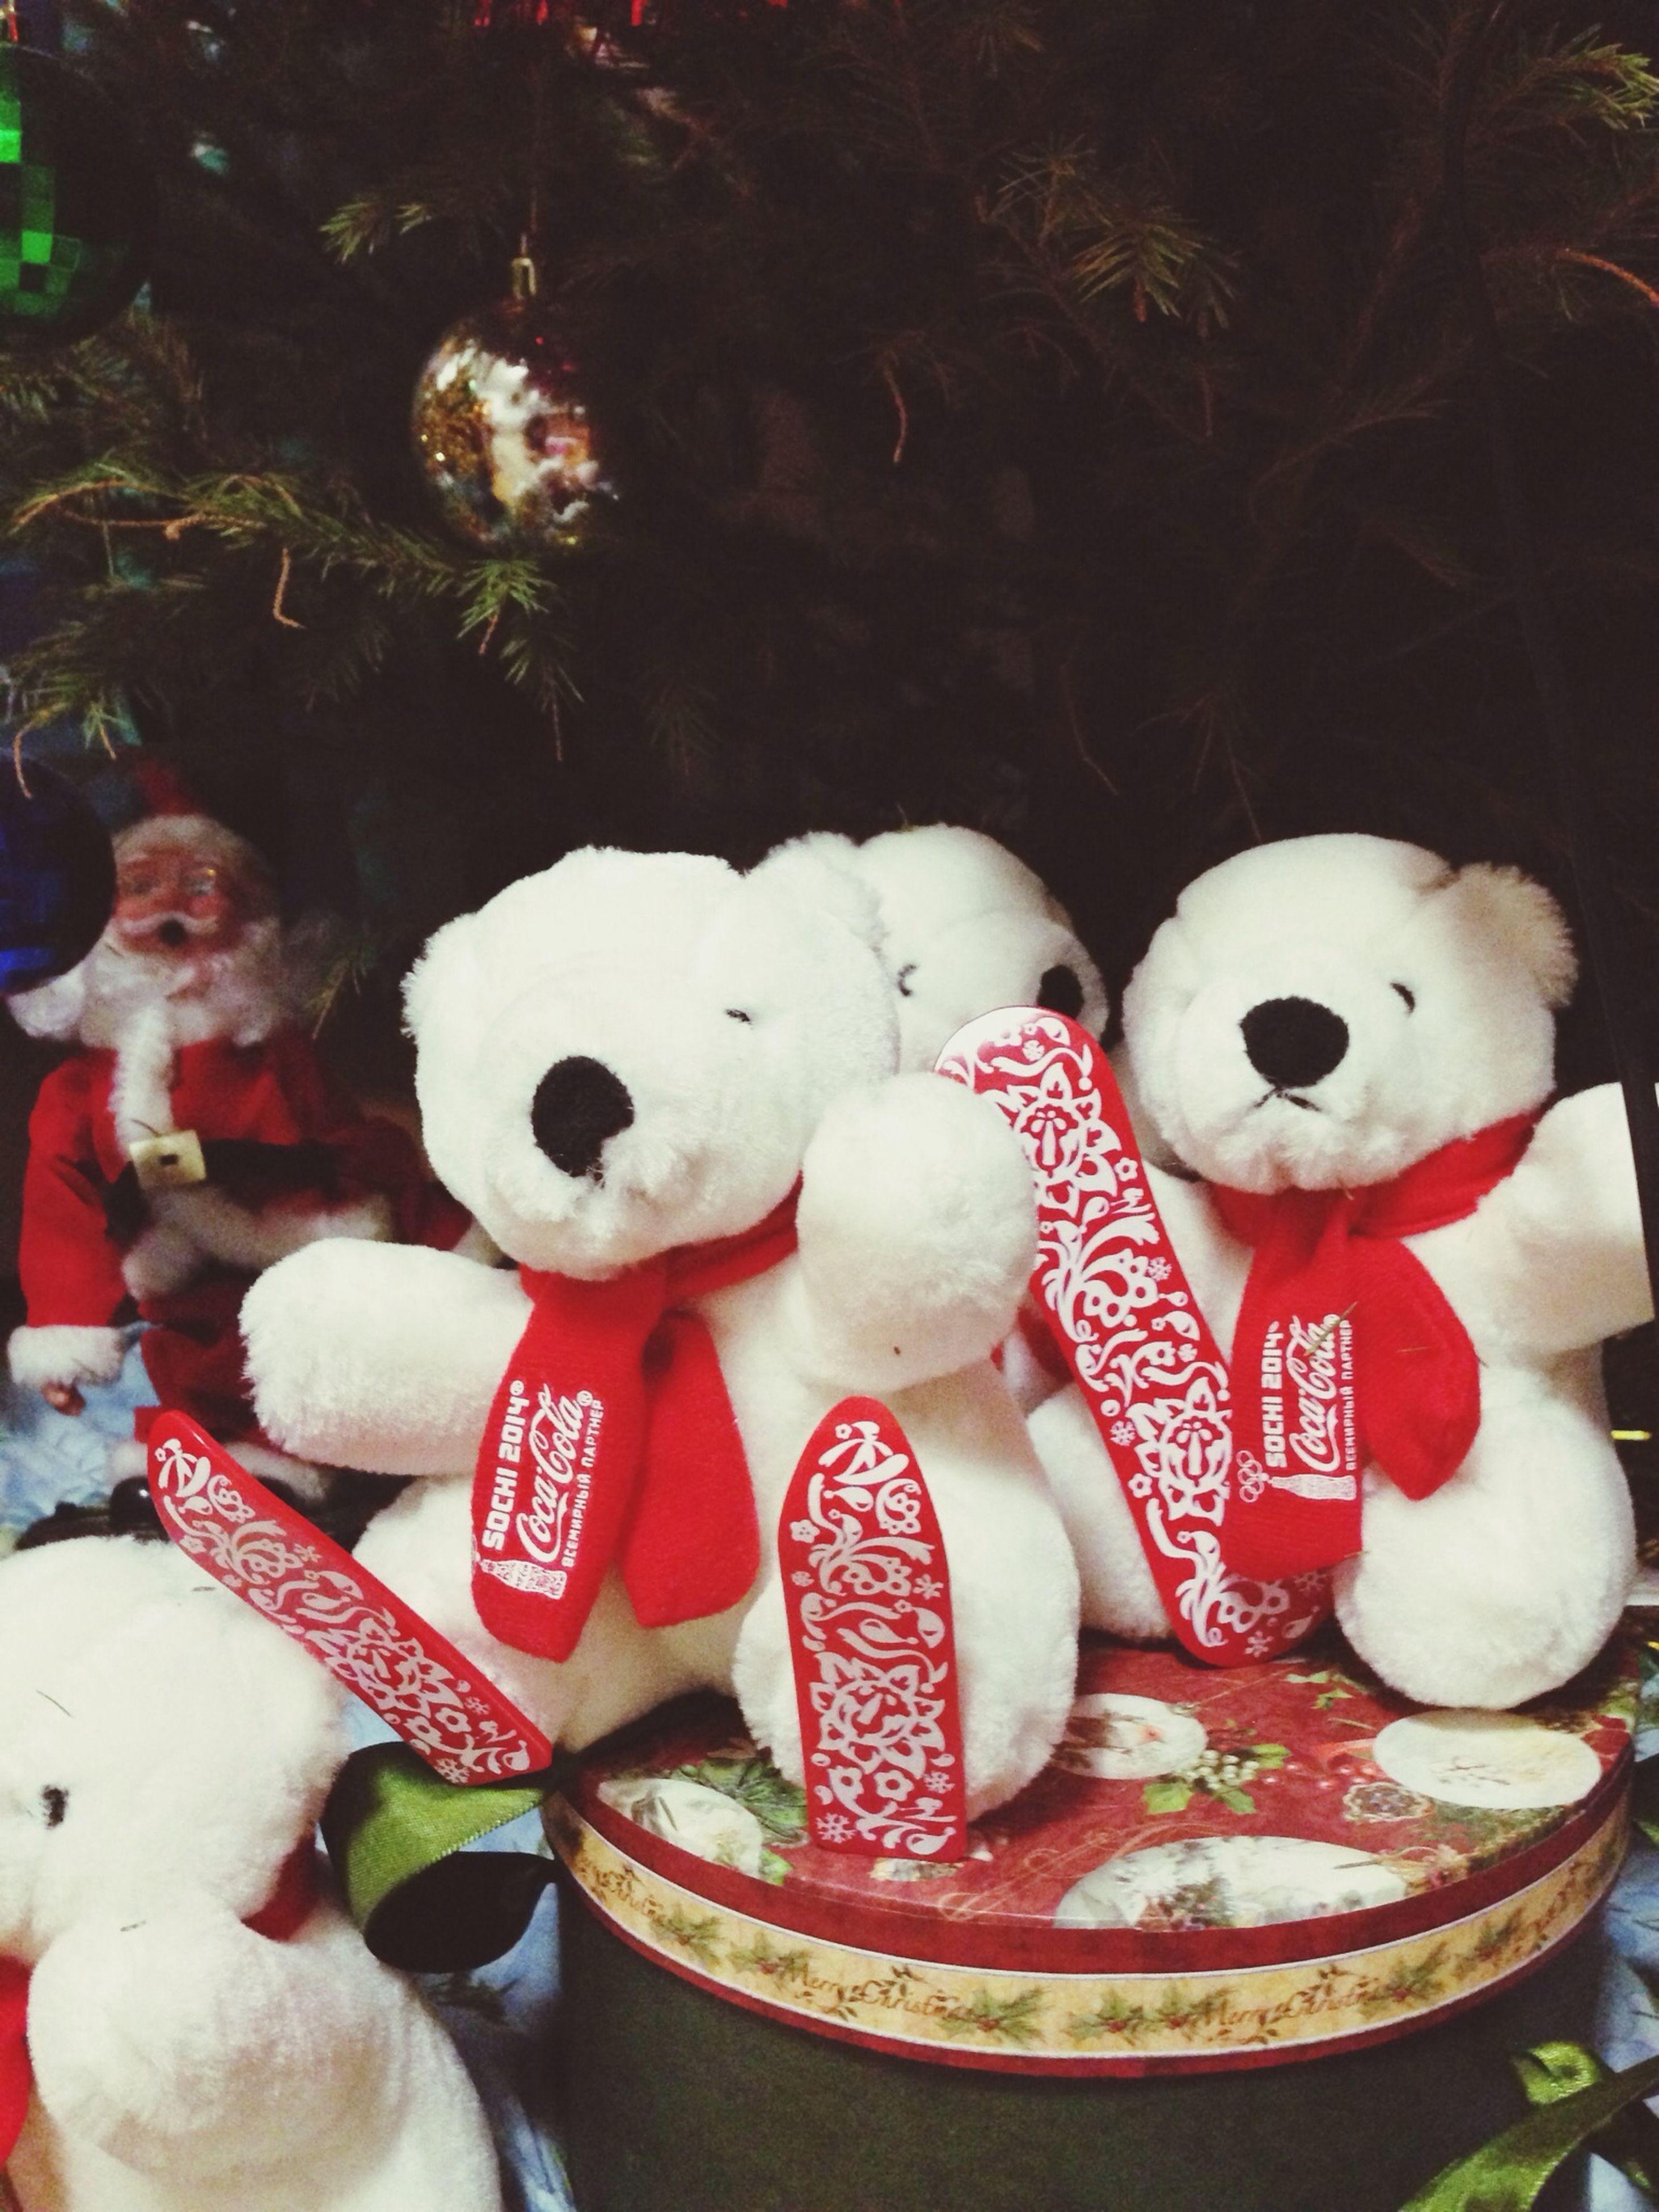 animal representation, toy, stuffed toy, human representation, creativity, art, art and craft, indoors, teddy bear, variation, white color, christmas, still life, figurine, celebration, decoration, close-up, multi colored